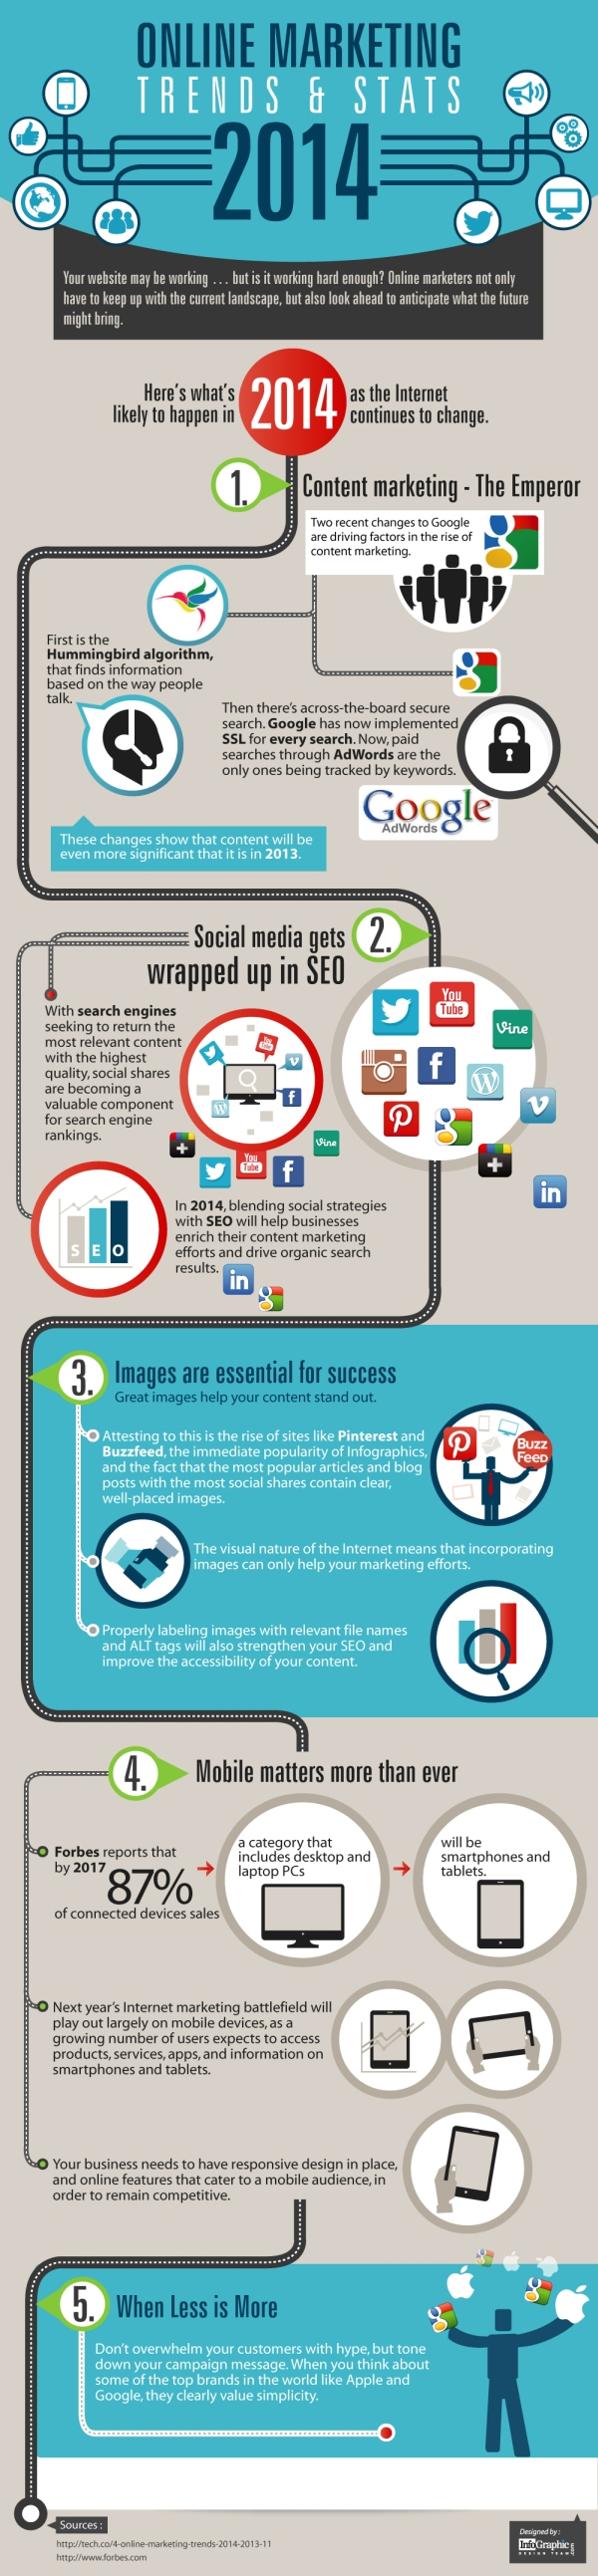 Online Marketing Trends for 2014